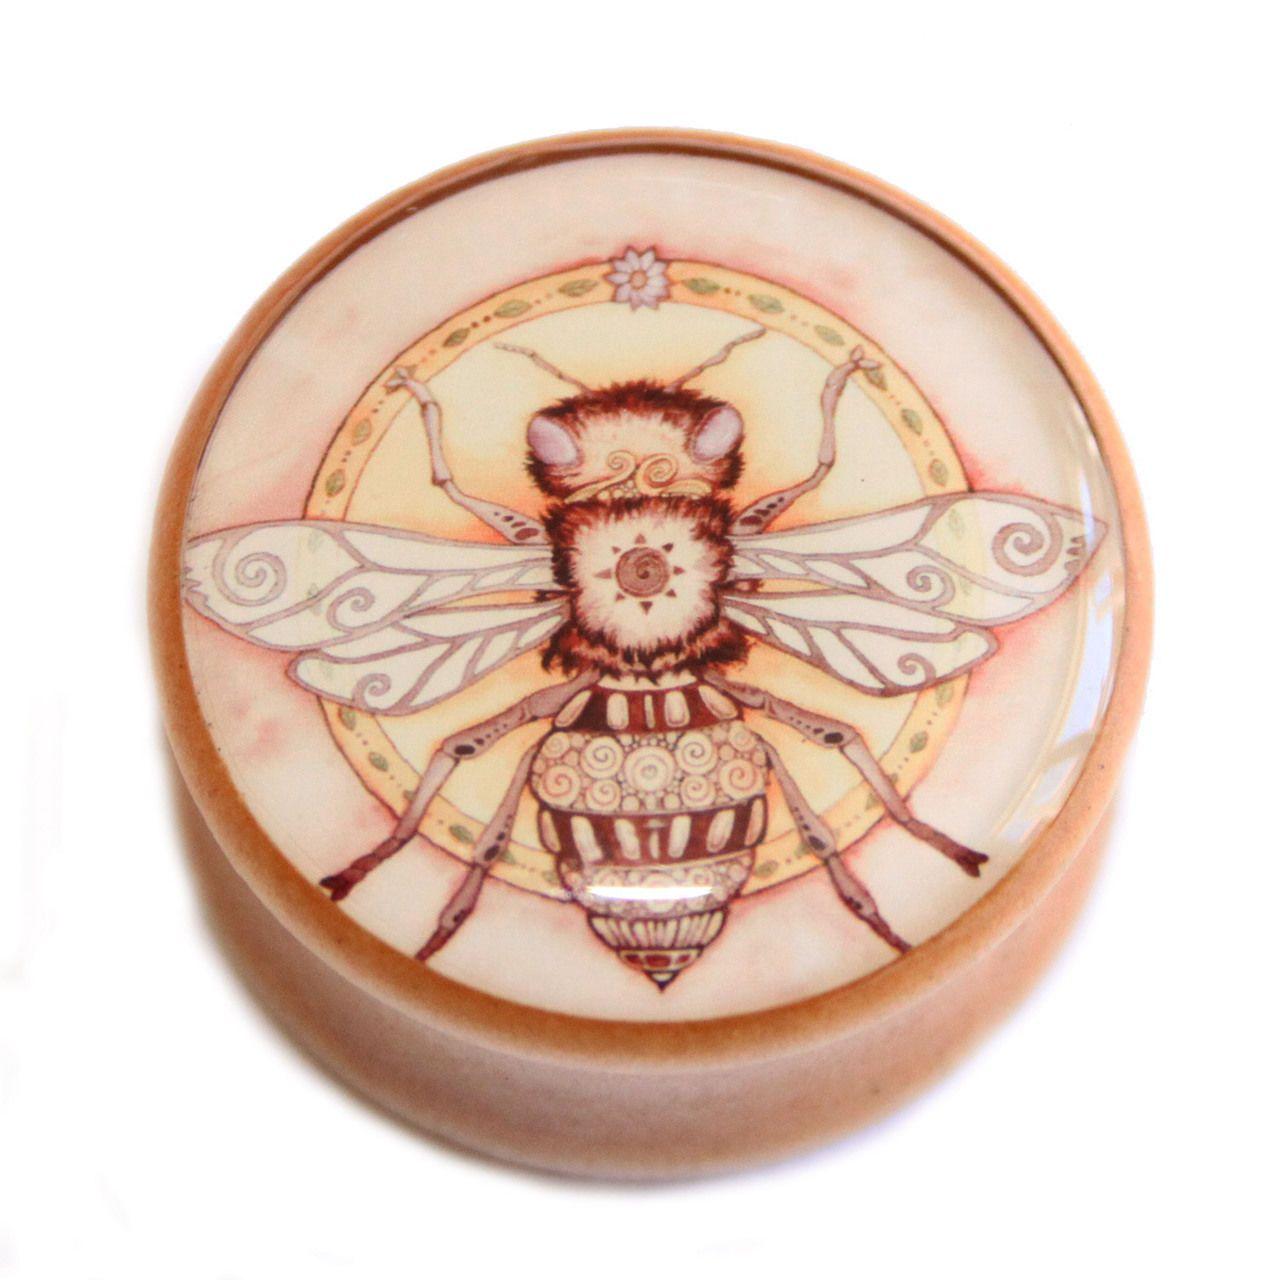 Vintage Bumble Bee on Wooden Saddle Ear Plug Flesh Tunnels